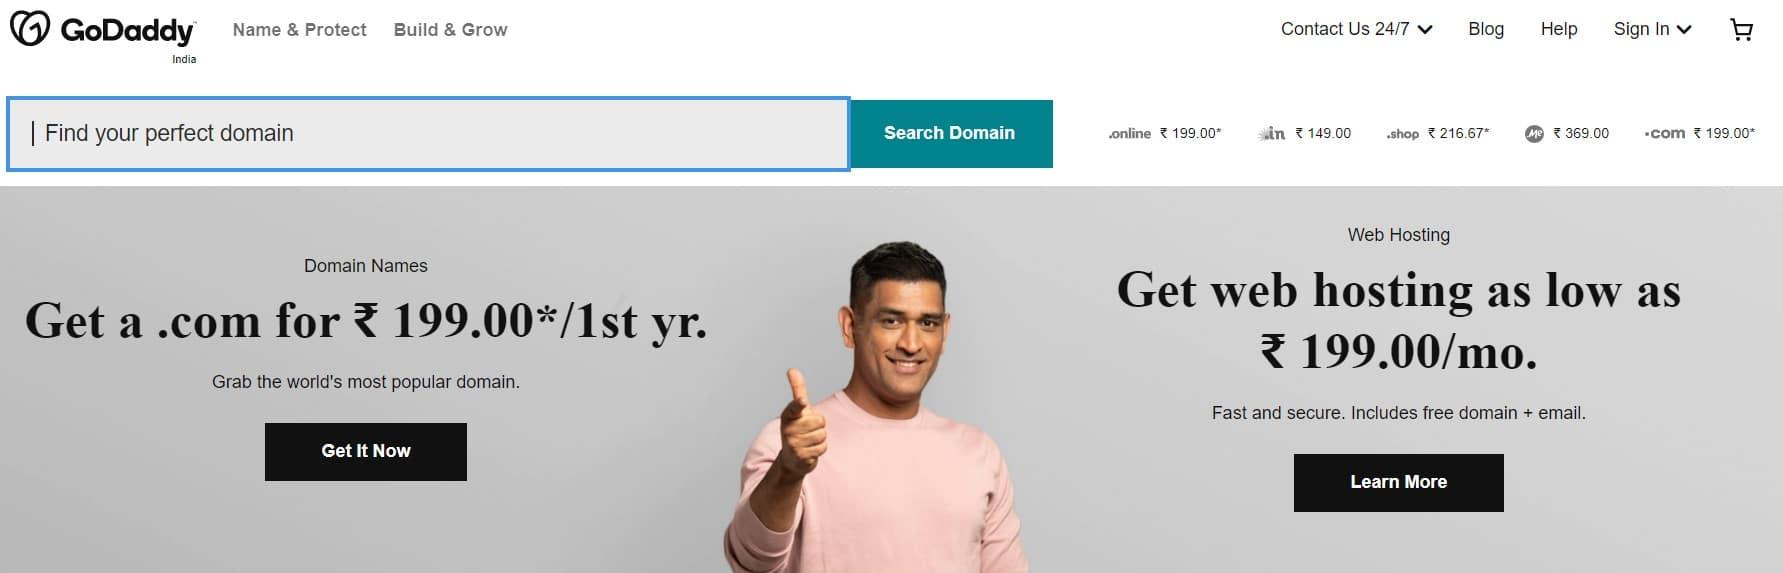 Step1: Buy Domain Name from GoDaddy